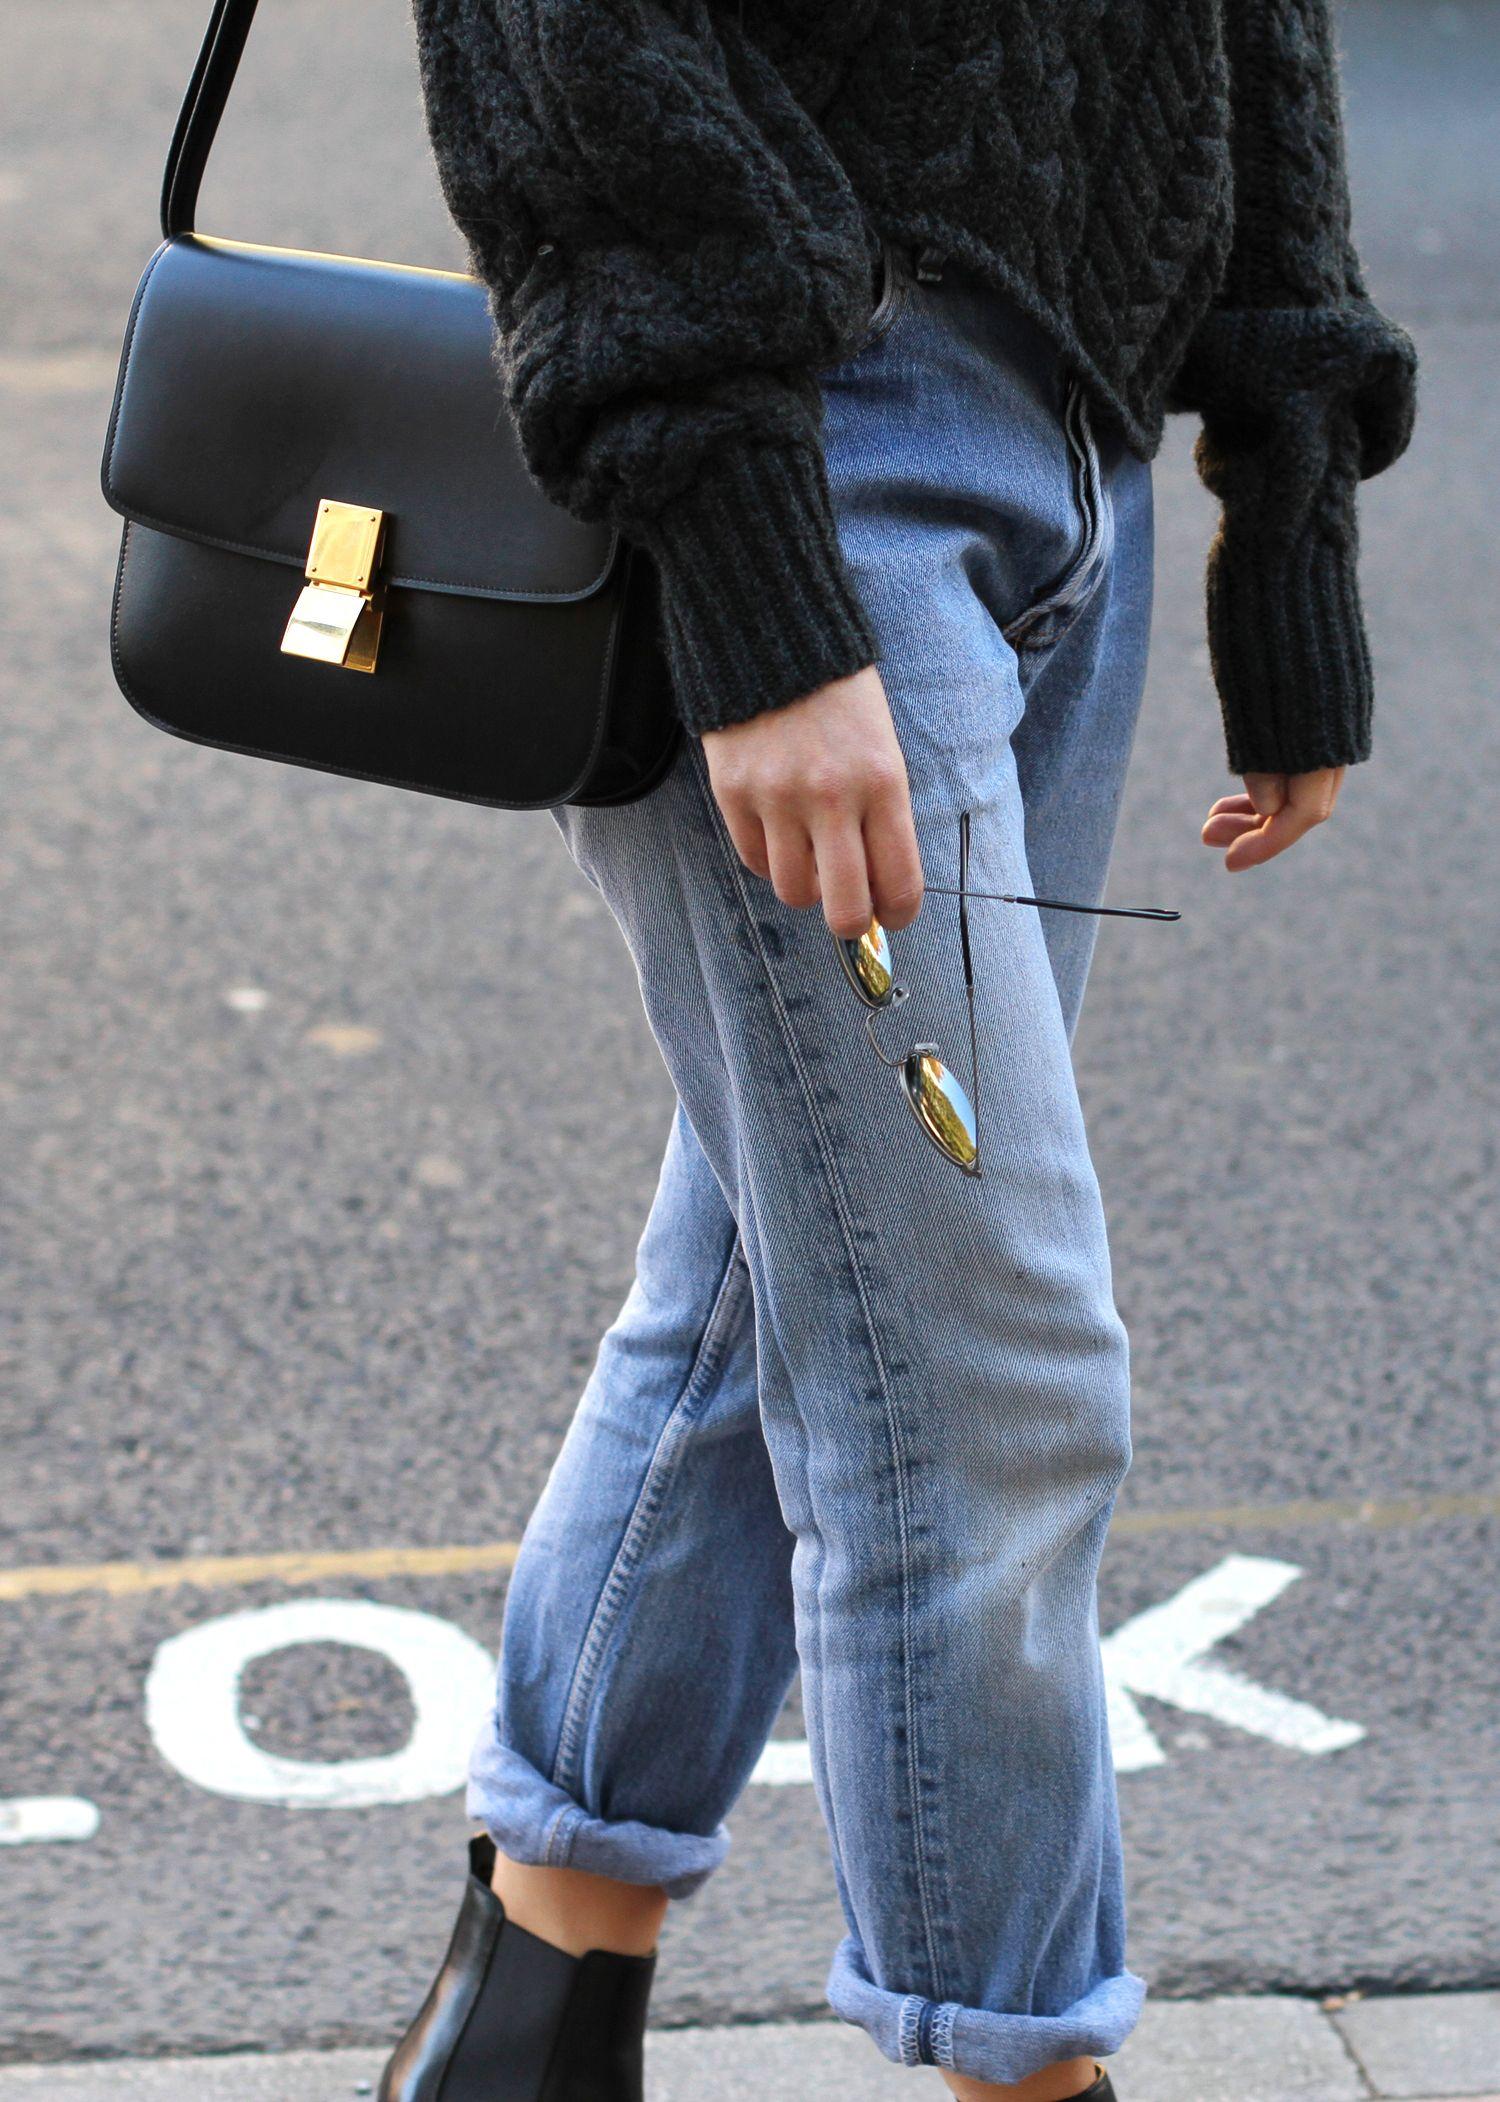 Céline box bag, Levis 501 & Isabel Marant knit. Via Mija